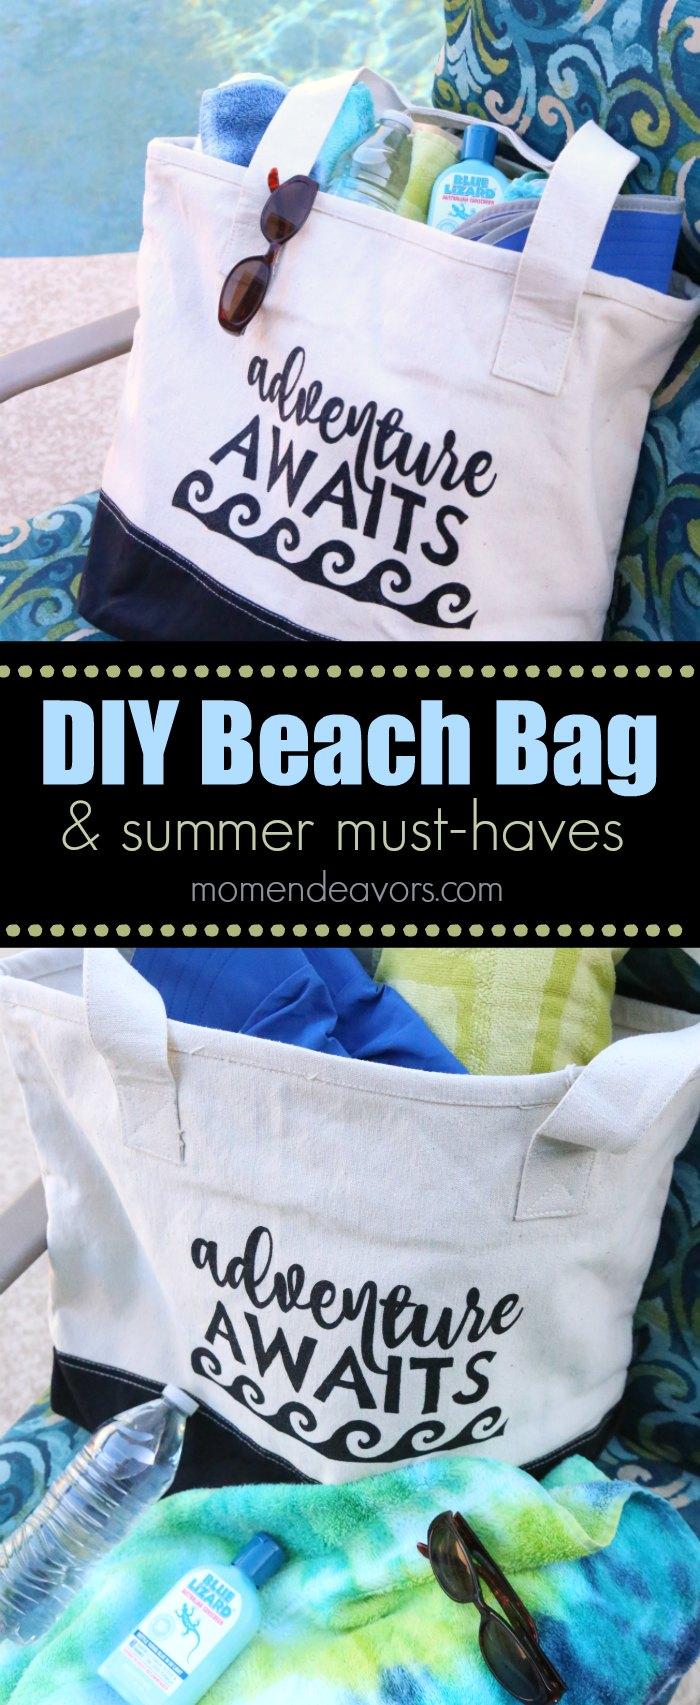 Summer Must Haves: DIY Beach Bag & Summer Fun Must-Haves